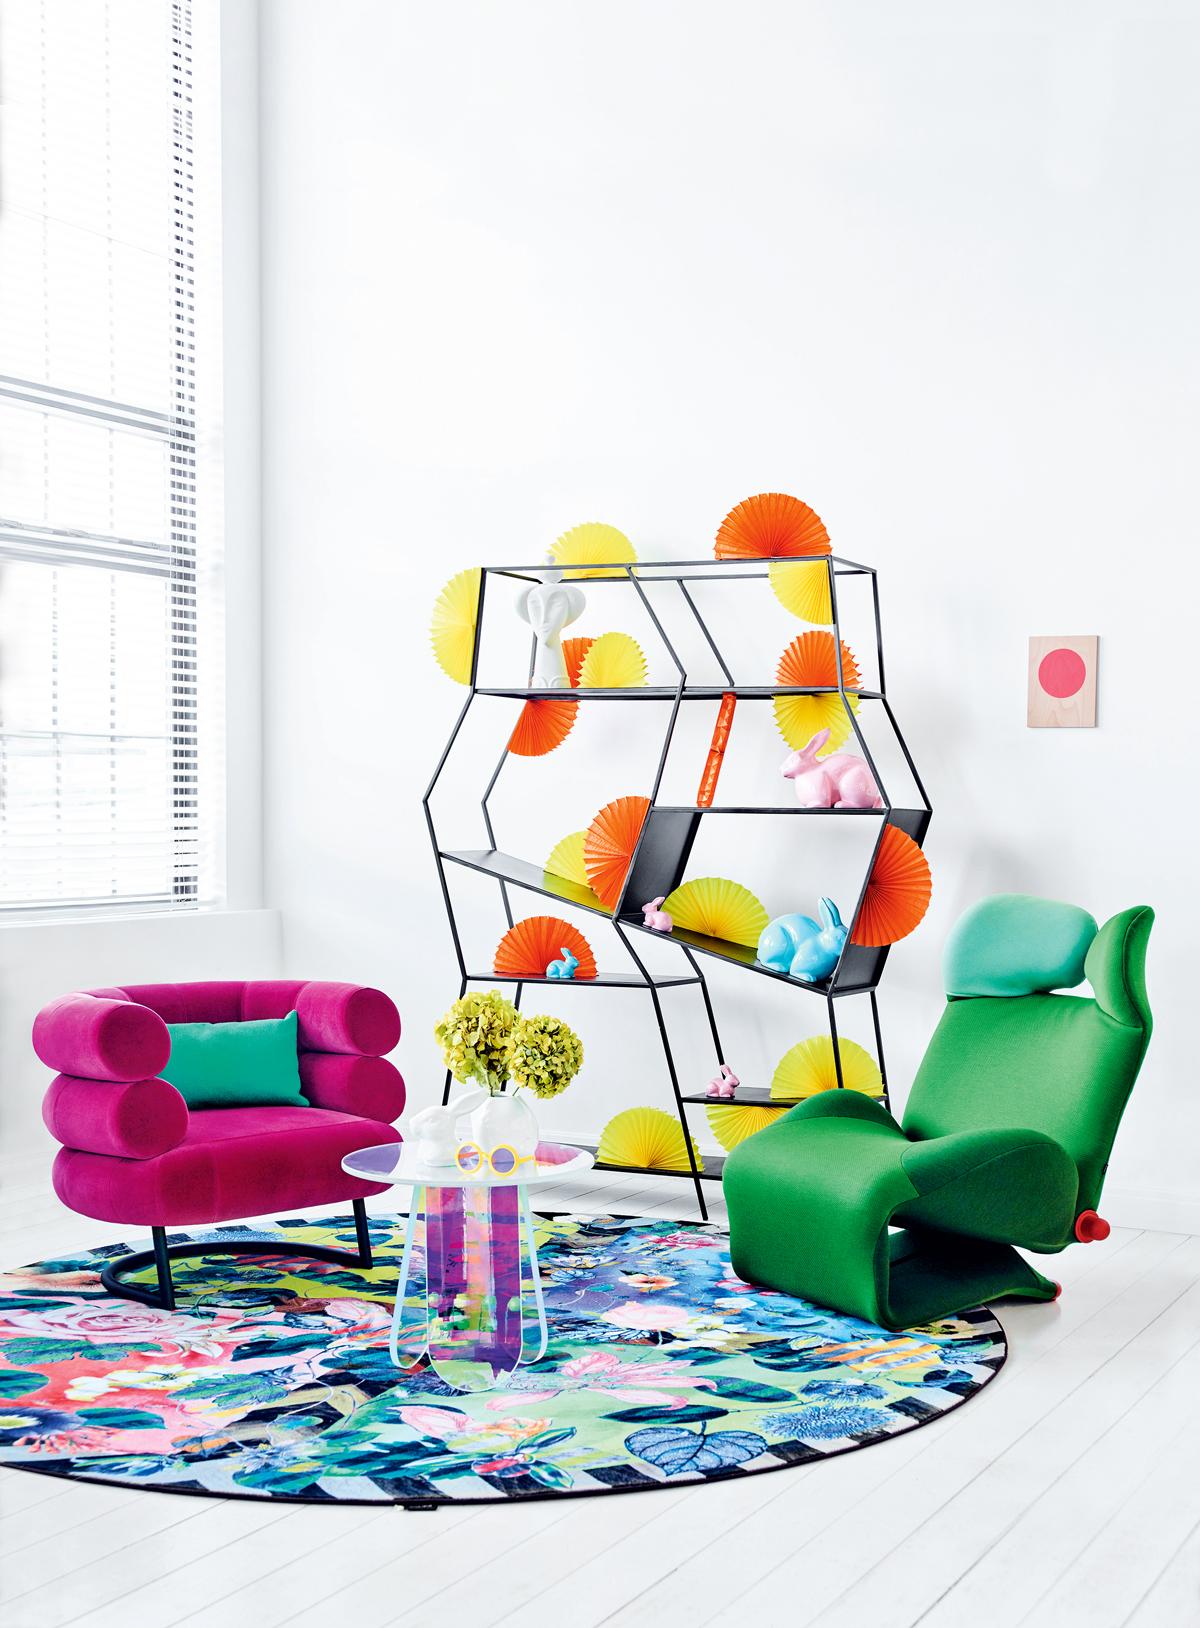 Bibendum Chair Left 2 514 Eileen Gray For Aram Designs At Wink Armchair Right 3 384 Toshiyuki Kita Cassina Shimmer Coffee Table